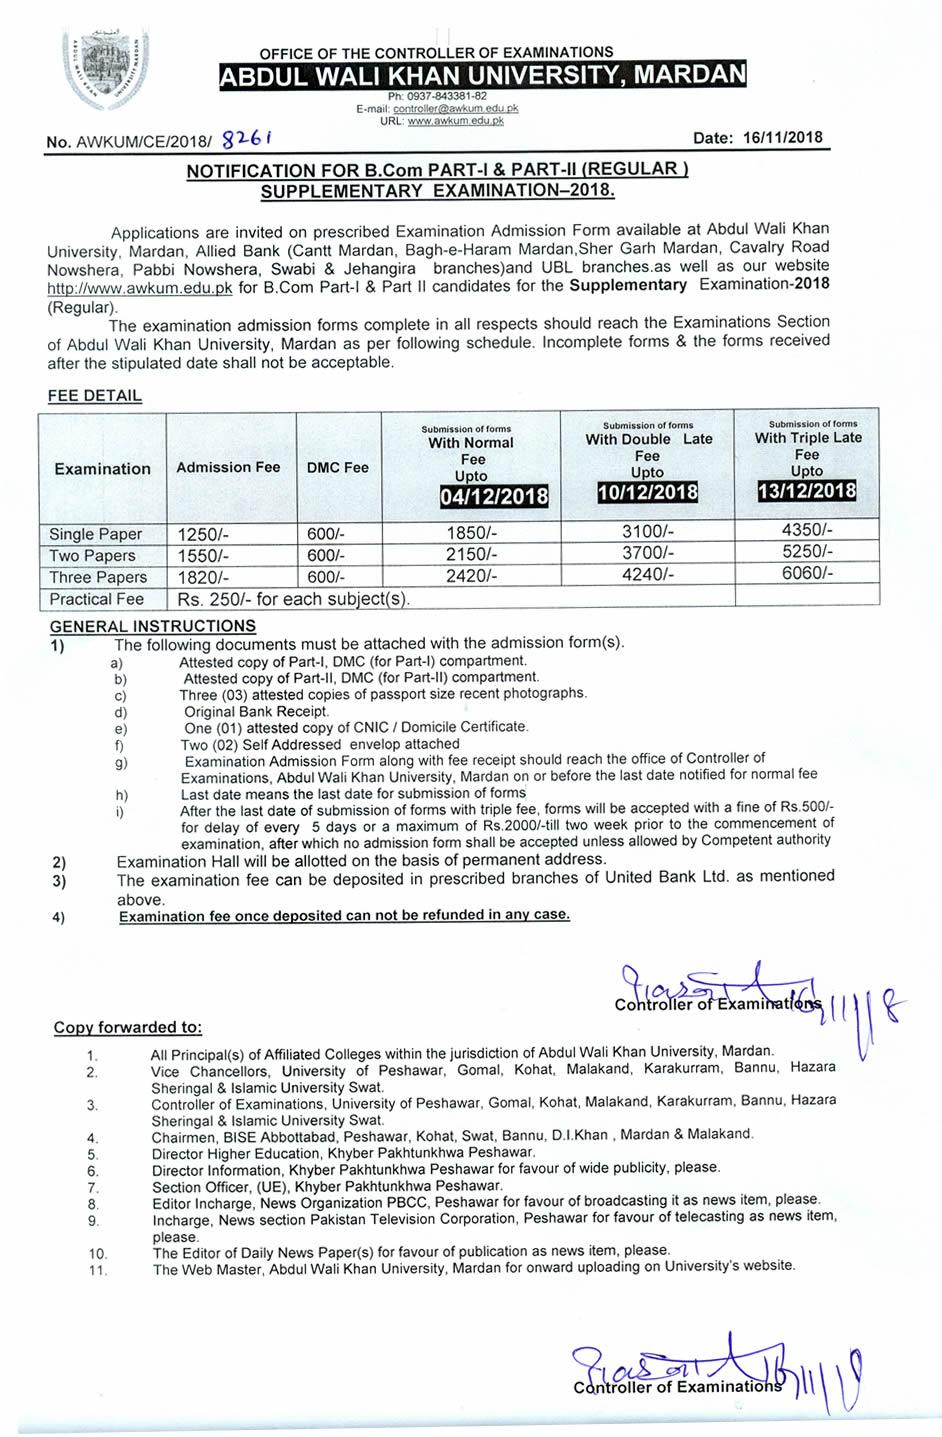 Abdul Wali Khan University Mardan: Notification For B Com